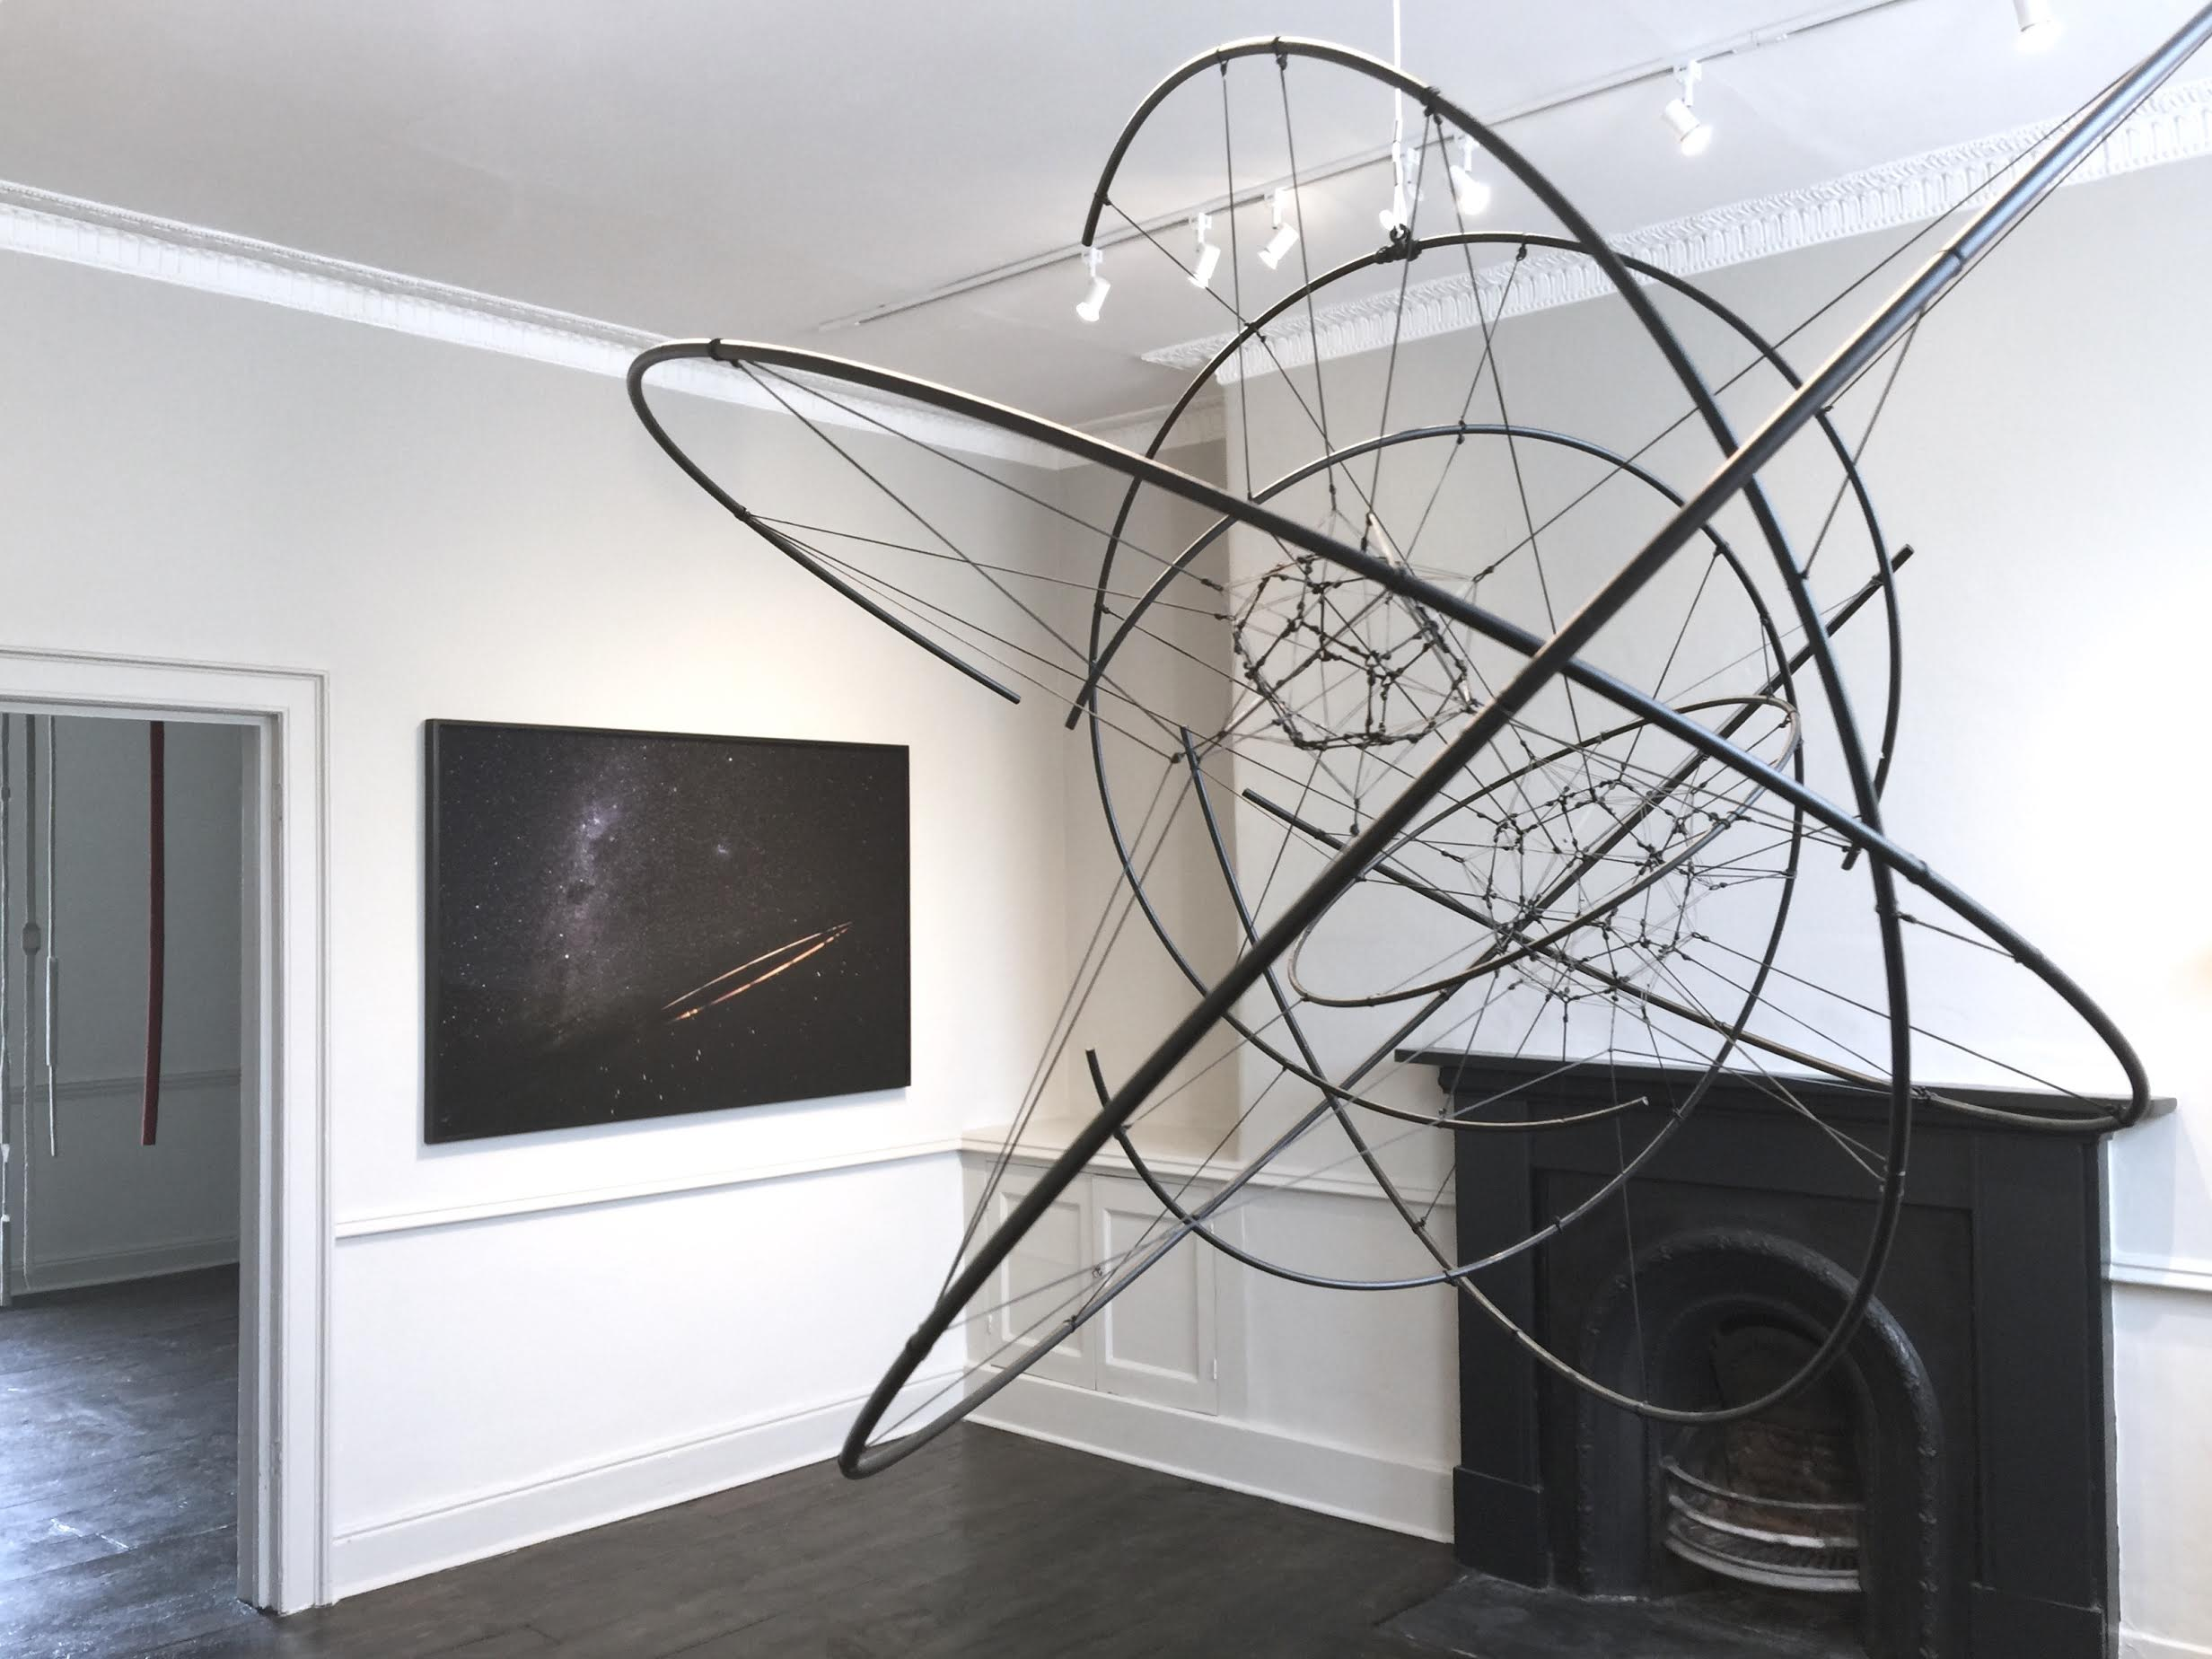 Installation view – Tomás Saraceno, Tonico Lemos Auad